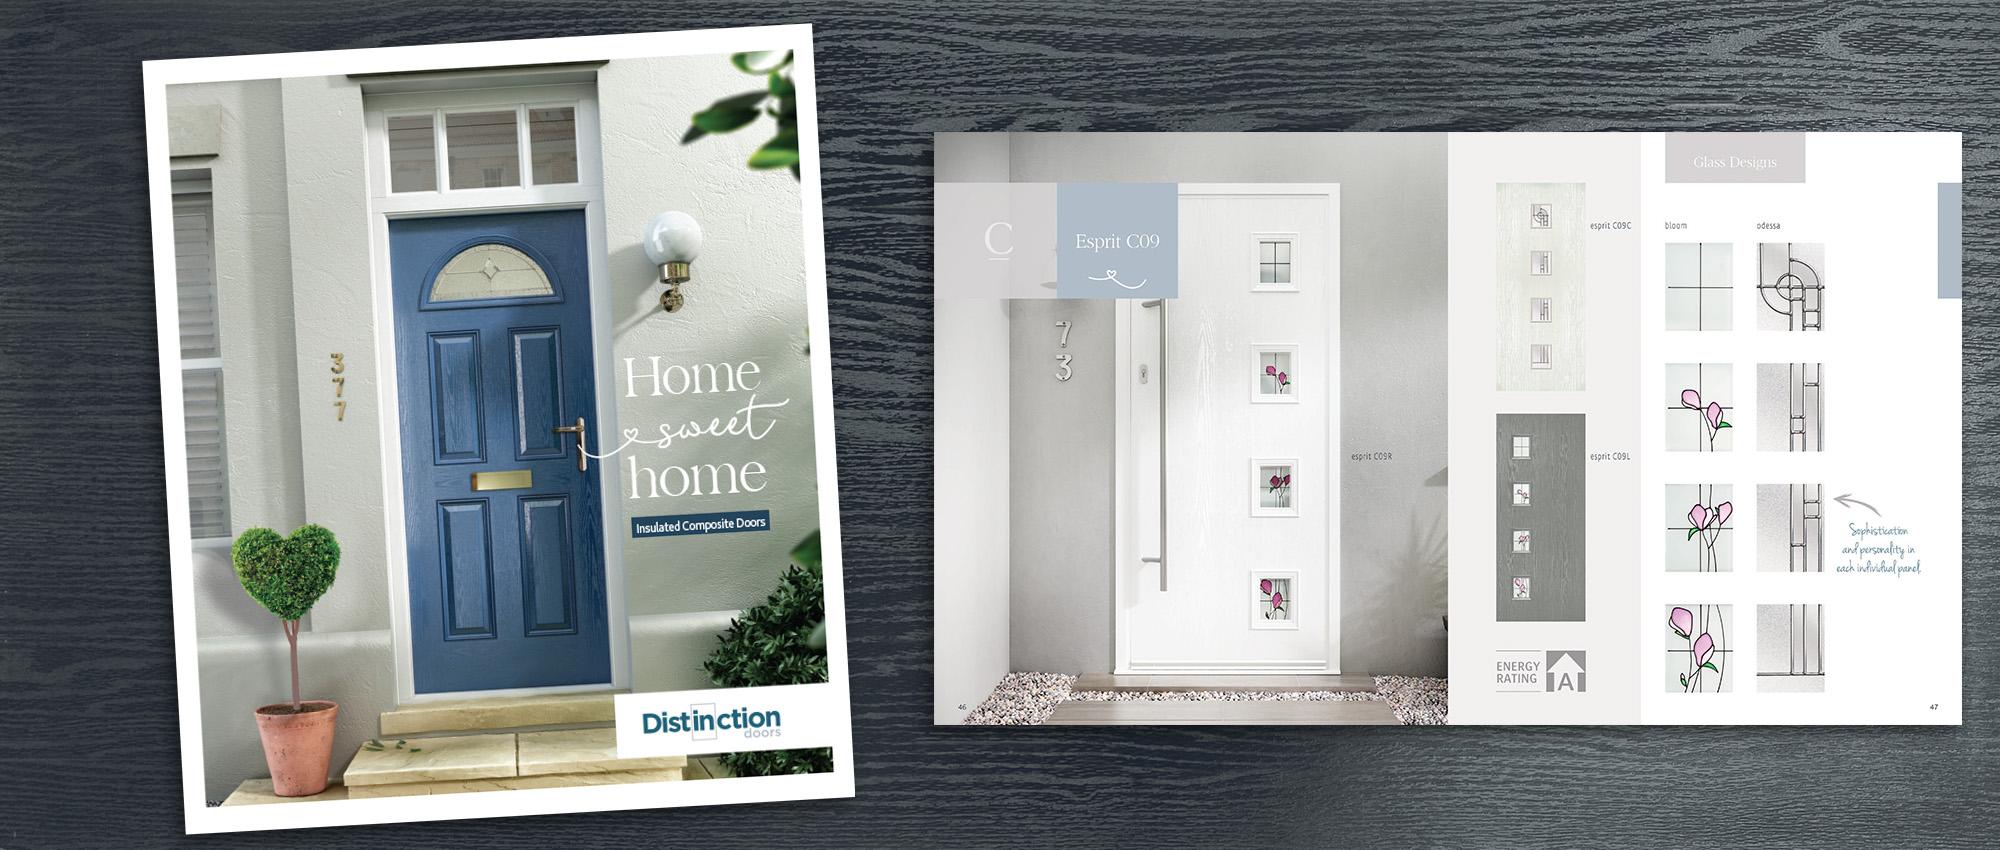 DISTINCTION DOORS NEW RETAIL BROCHURE IN HIGH DEMAND & DISTINCTION DOORS NEW RETAIL BROCHURE IN HIGH DEMAND | Glass News